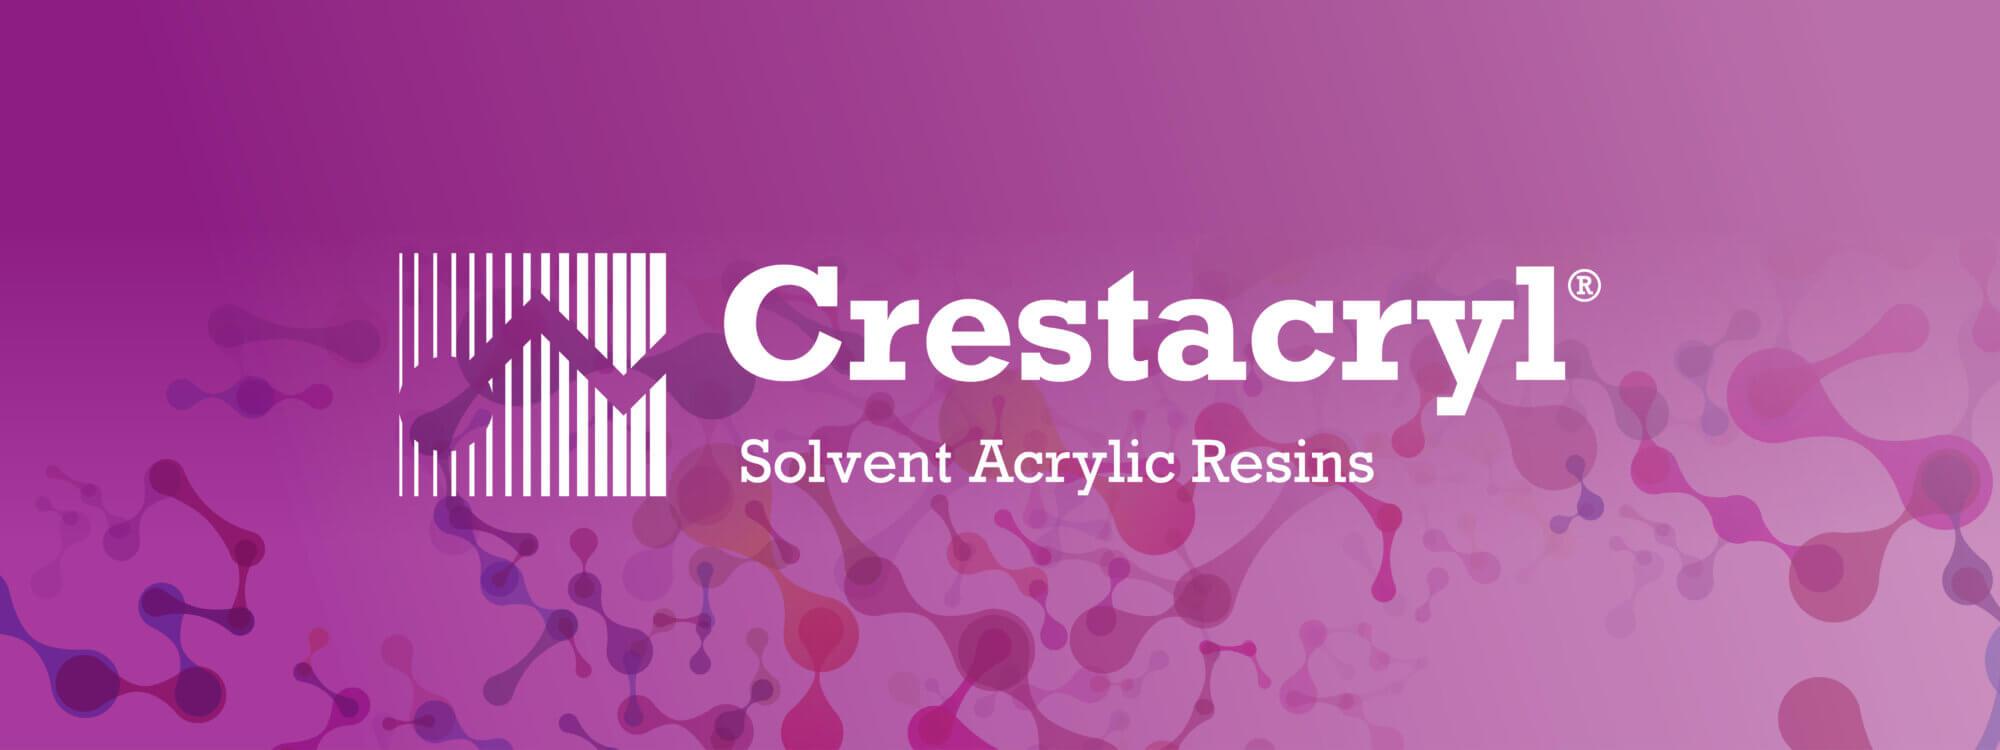 Crestacryl 71-8026